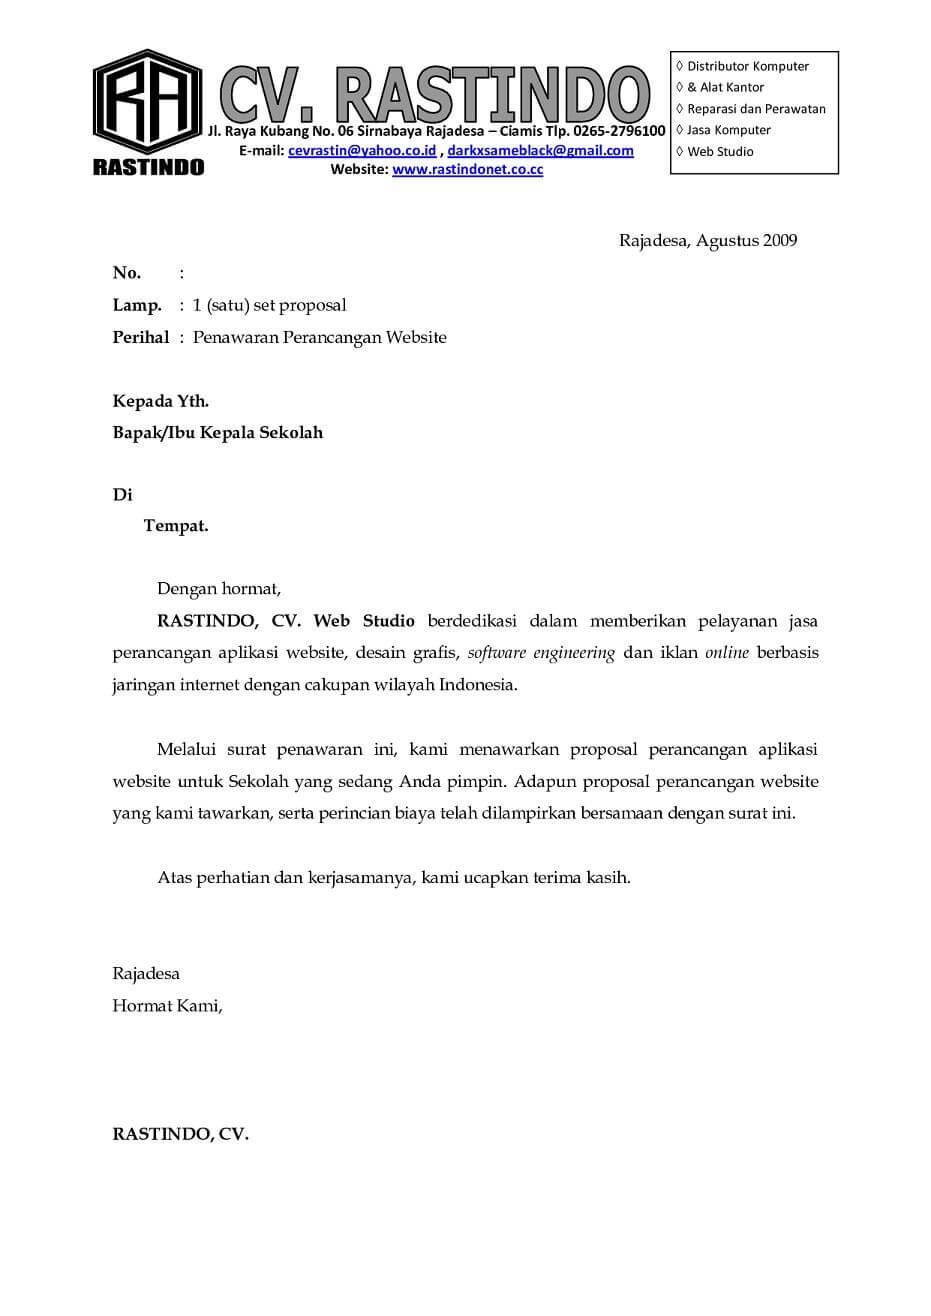 Surat Penawaran Perancangan Website